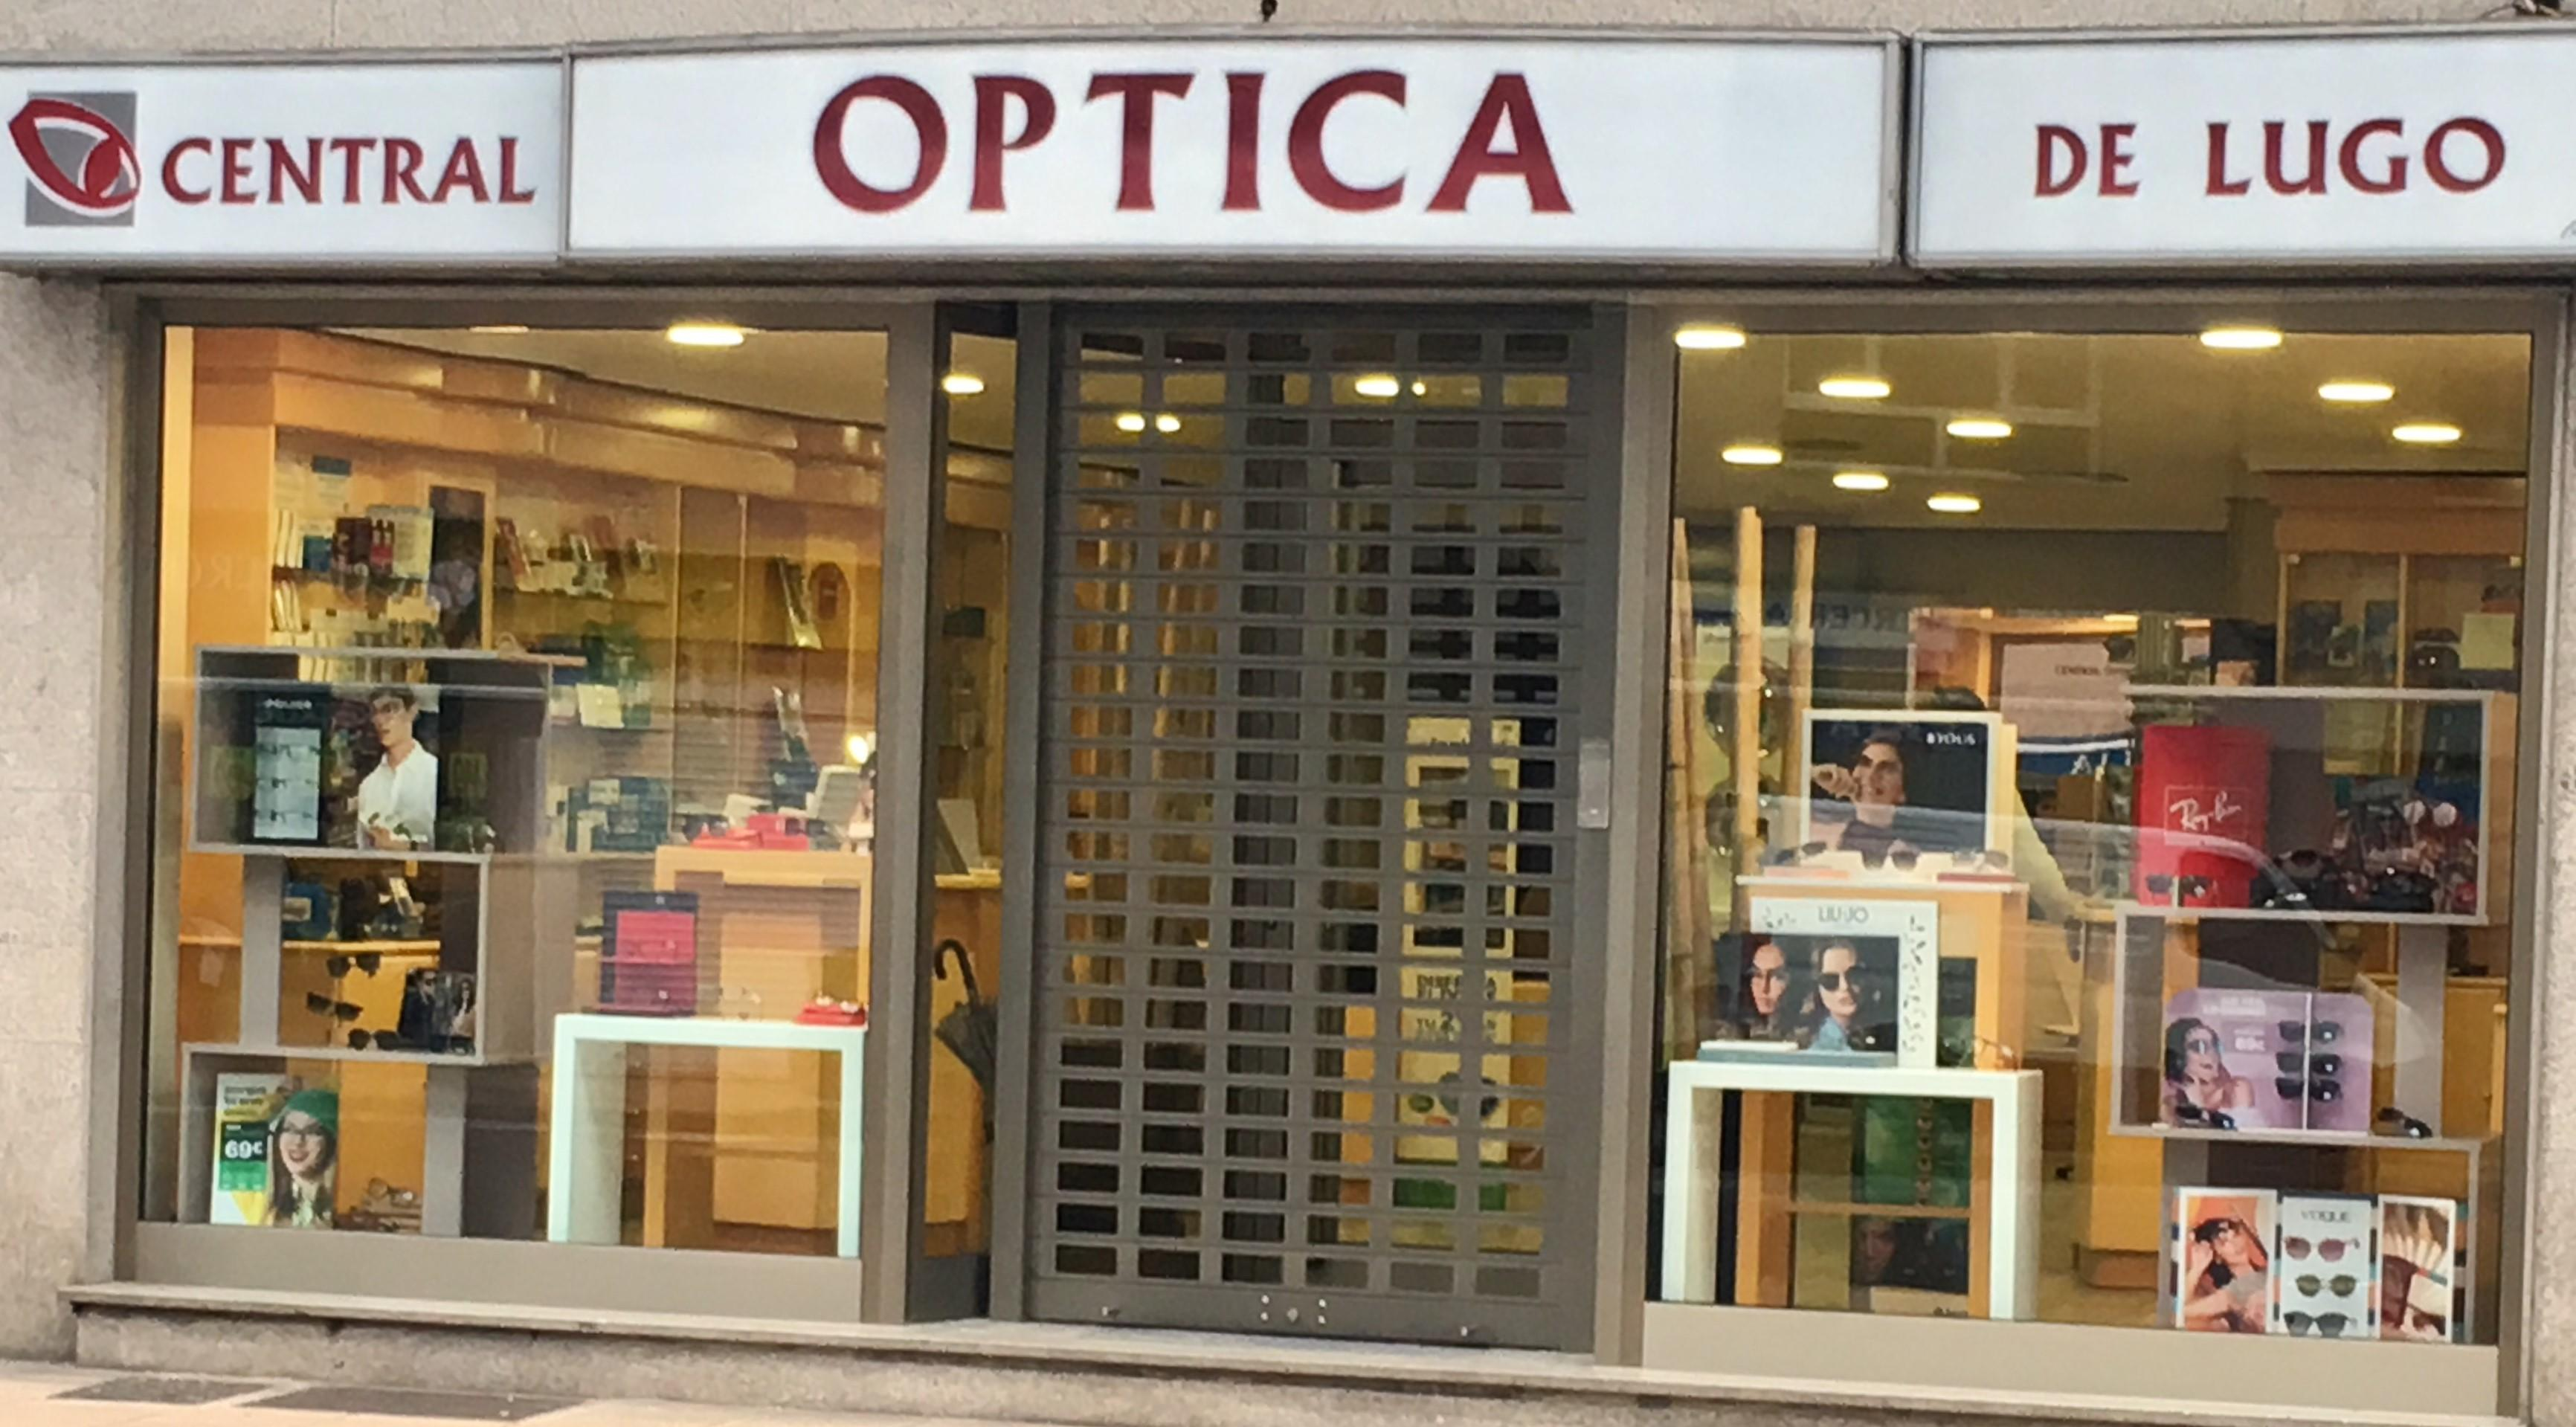 Central Óptica de Lugo